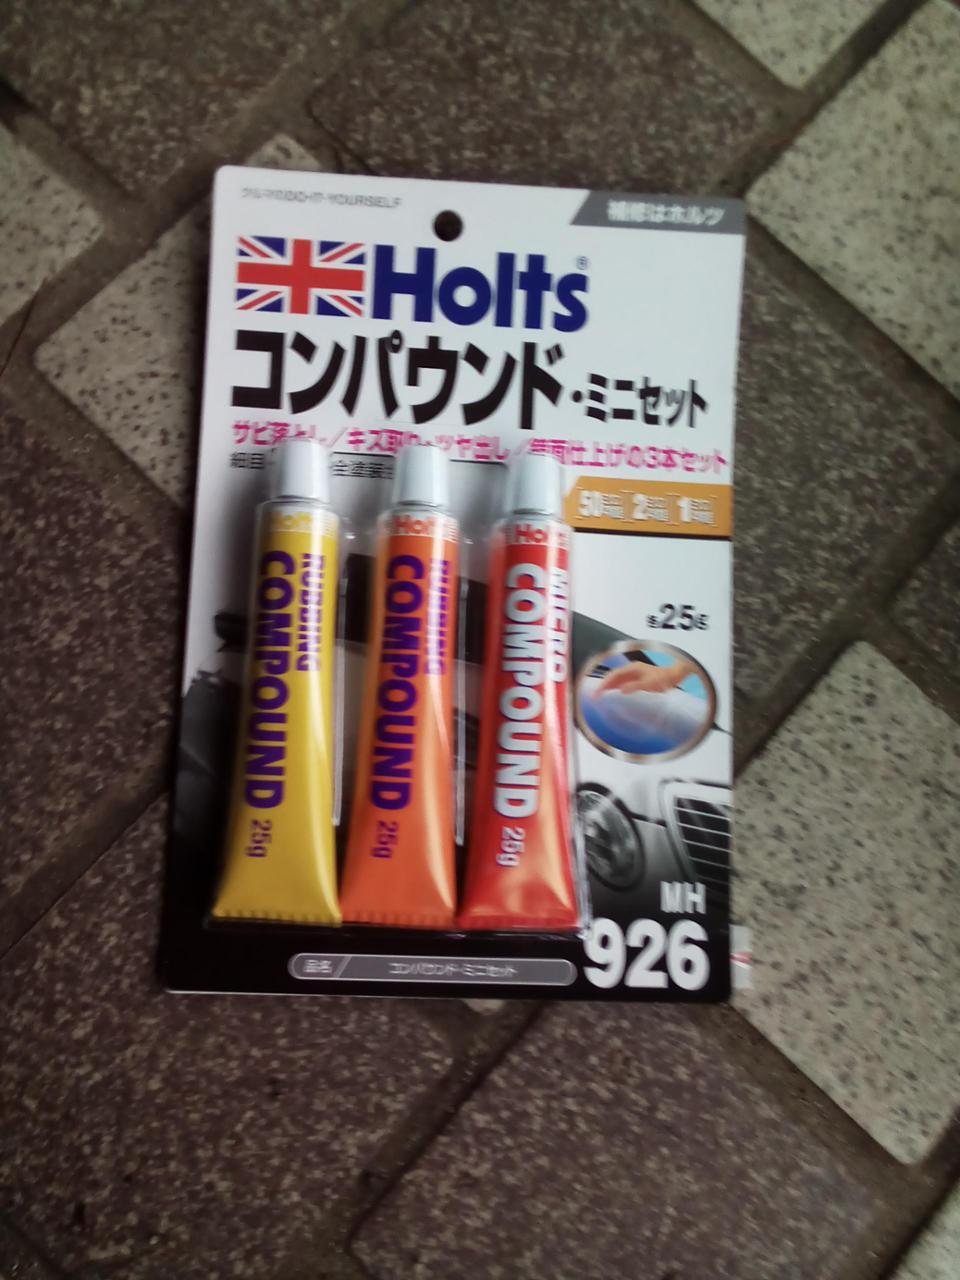 Holts / 武蔵ホルト コンパウンド ミニセット